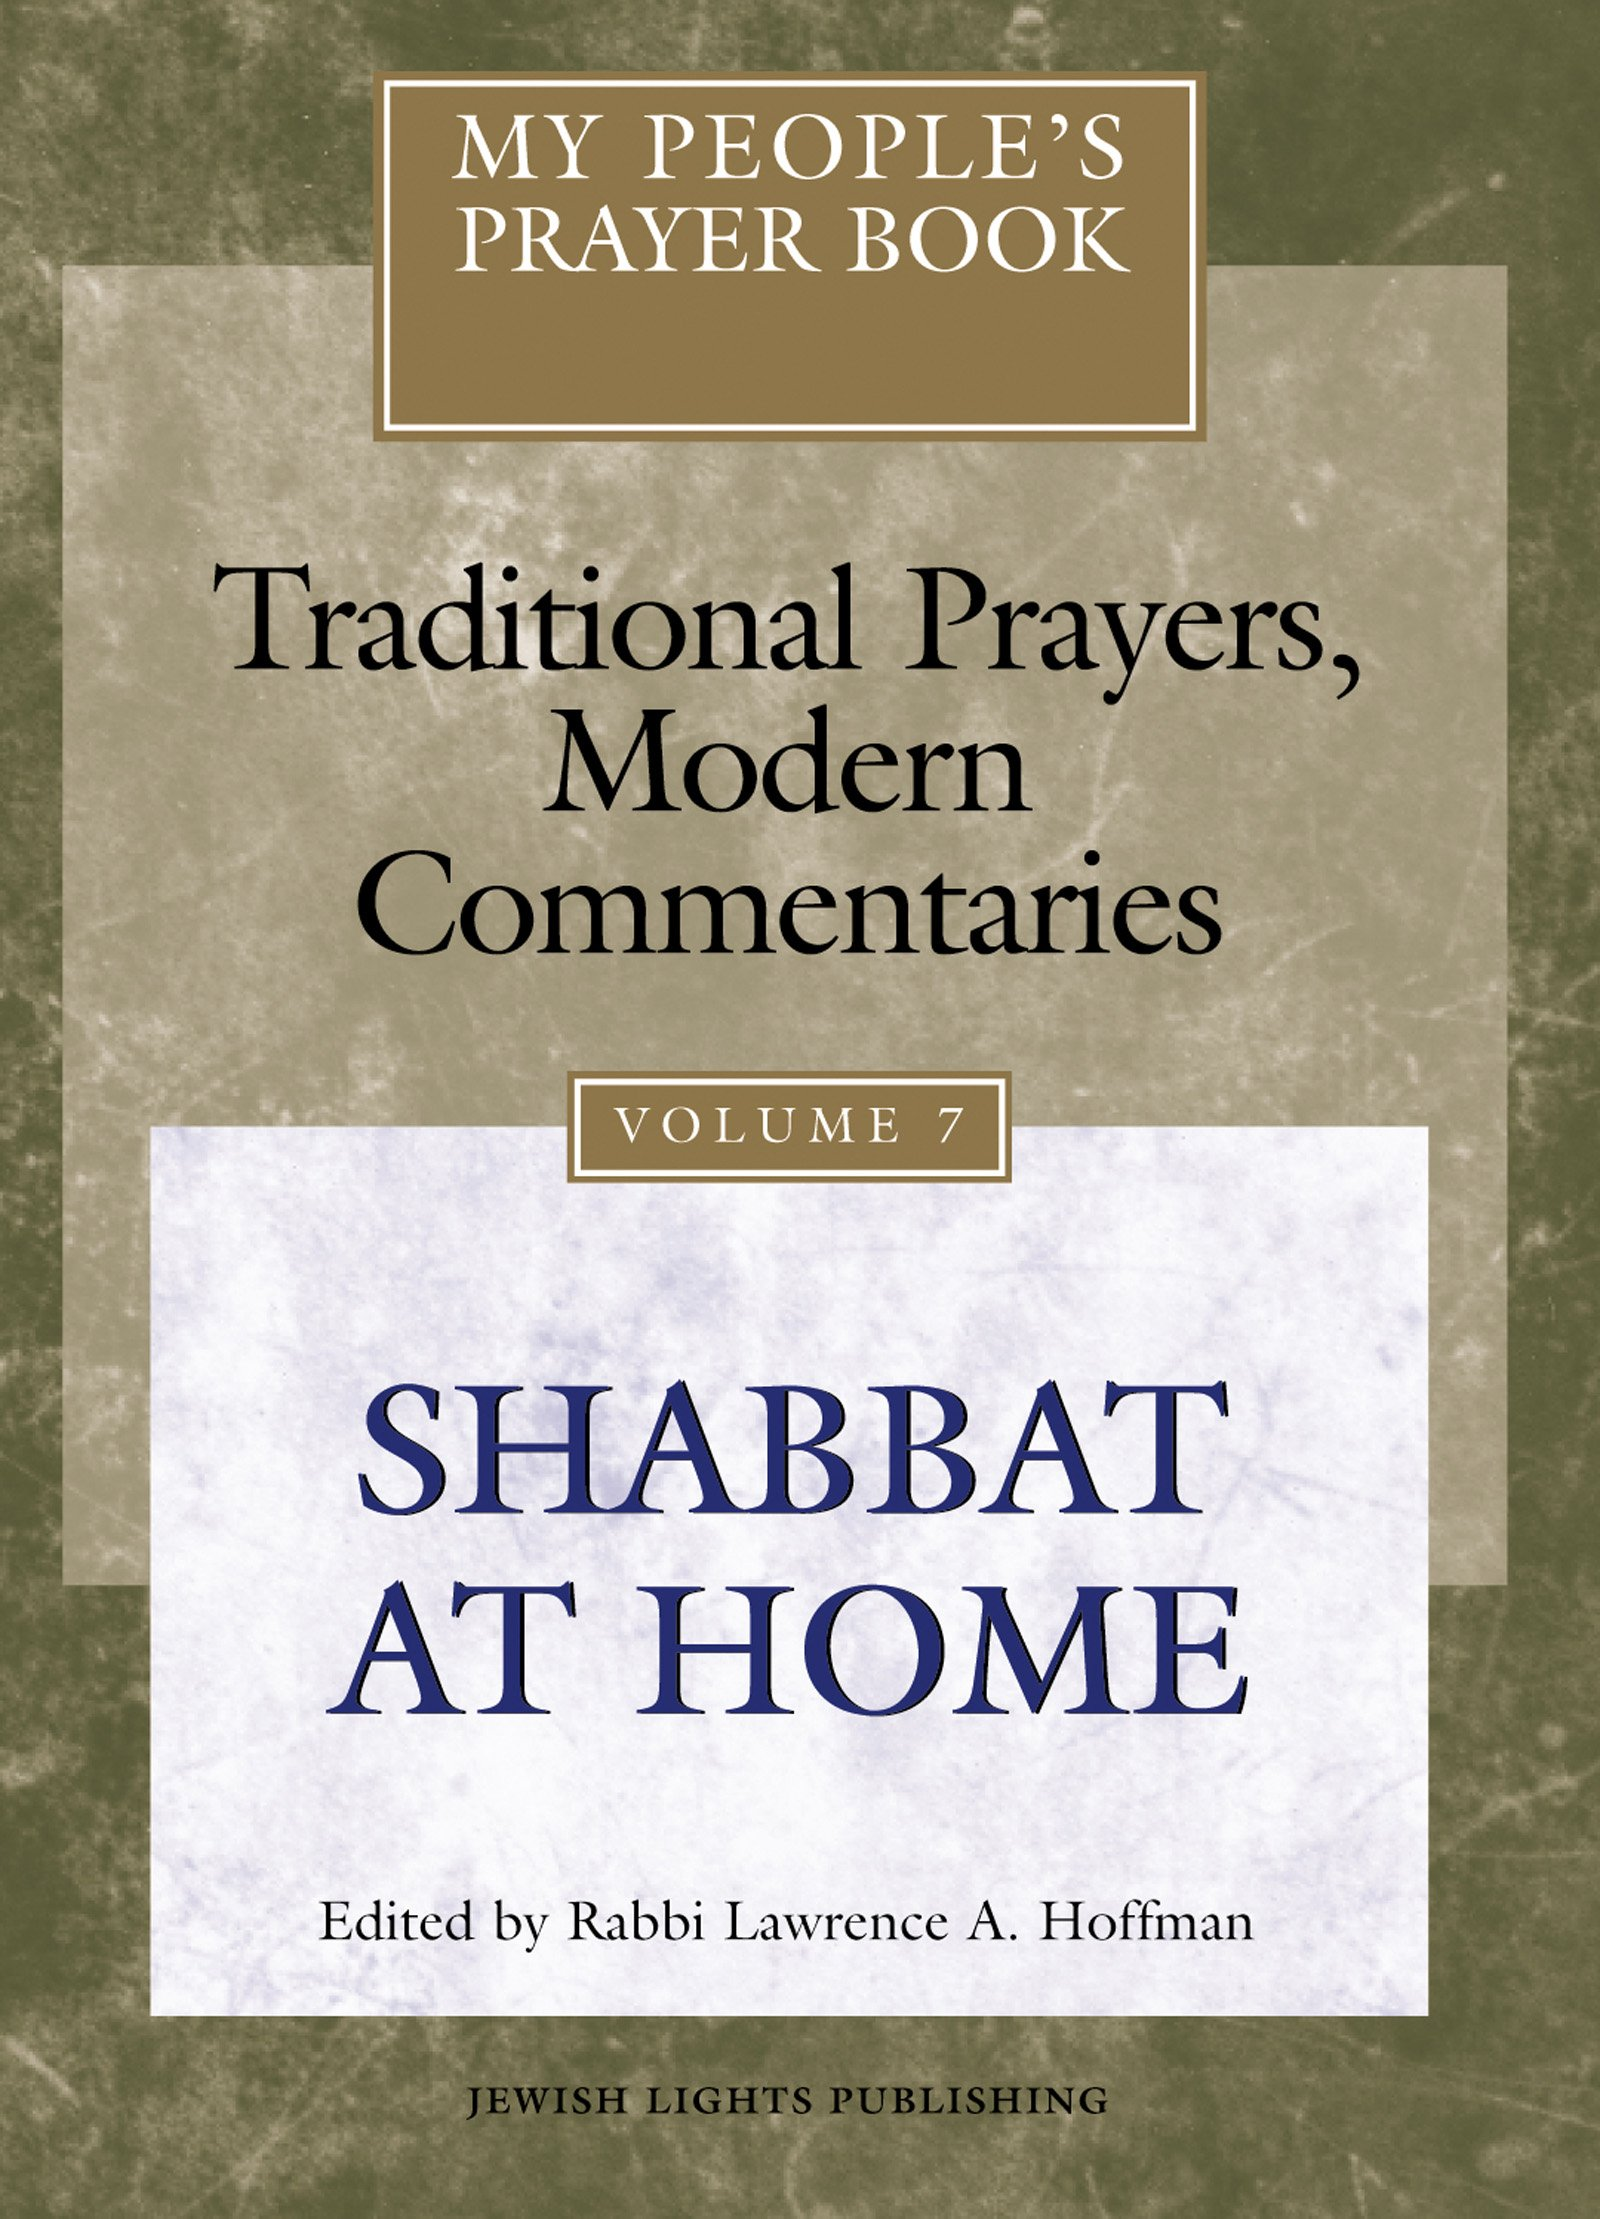 My People's Prayer Book Vol 7: Shabbat at Home: Rabbi